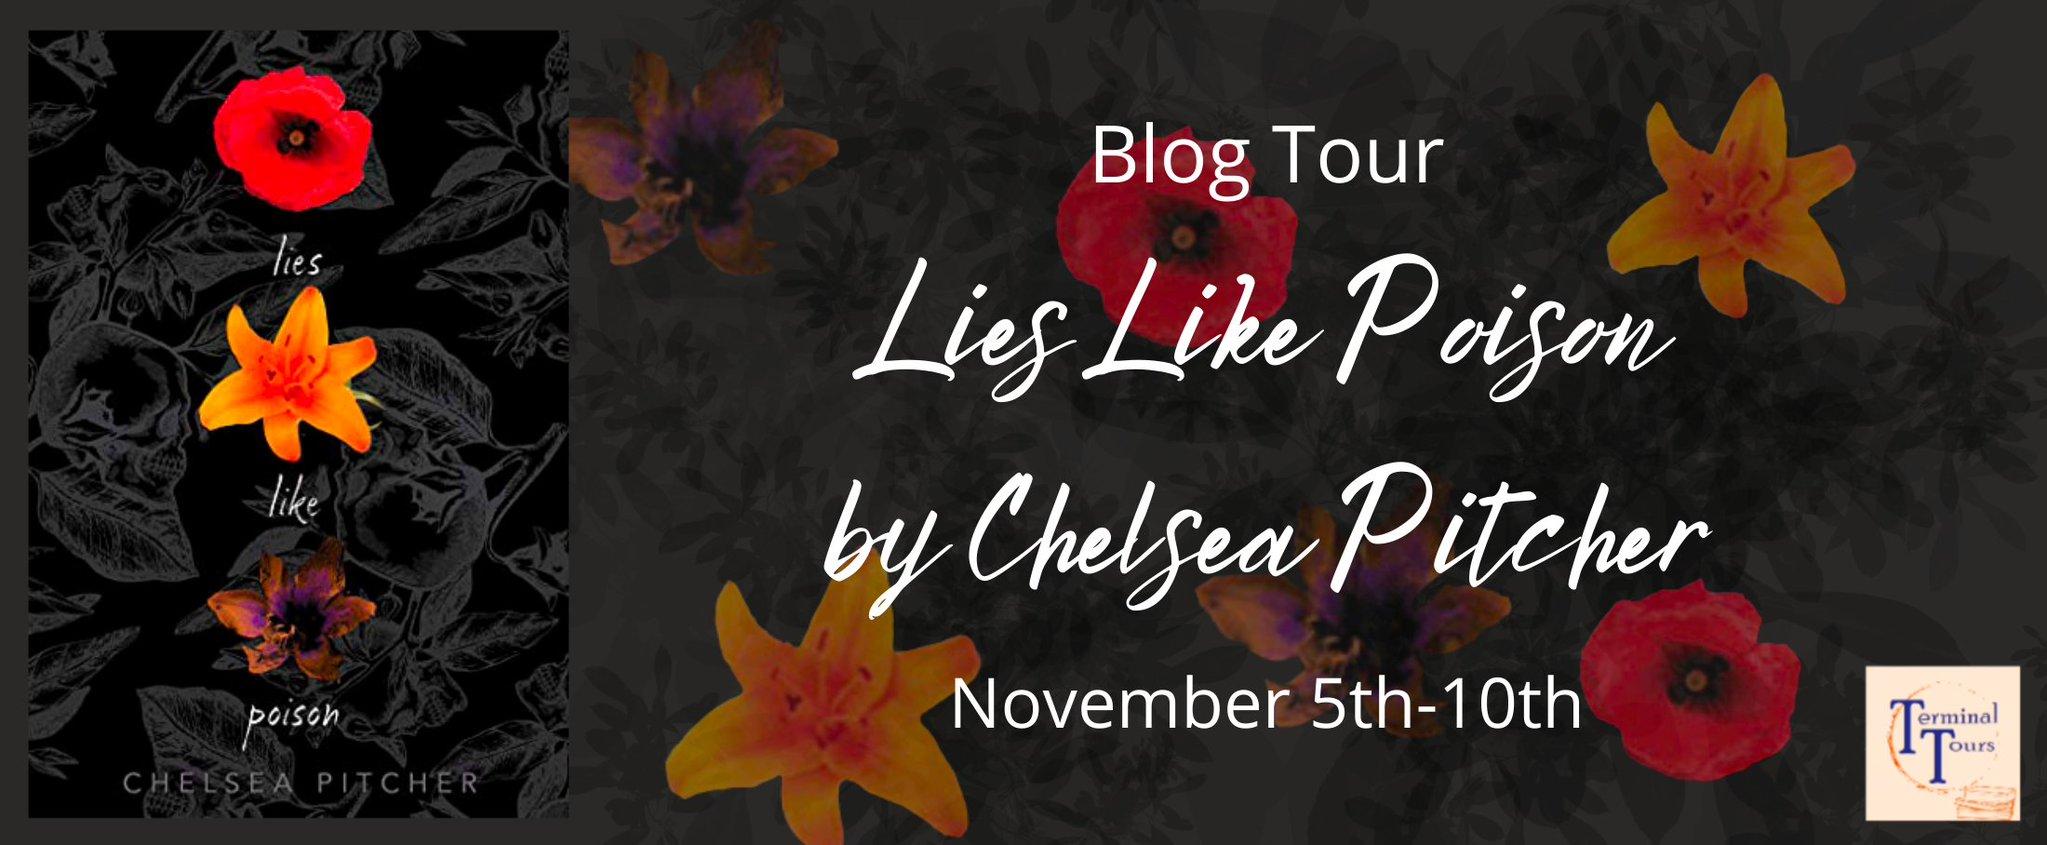 Blog Tour: Lies Like Poison by Chelsea Pitcher (Spotlight!)